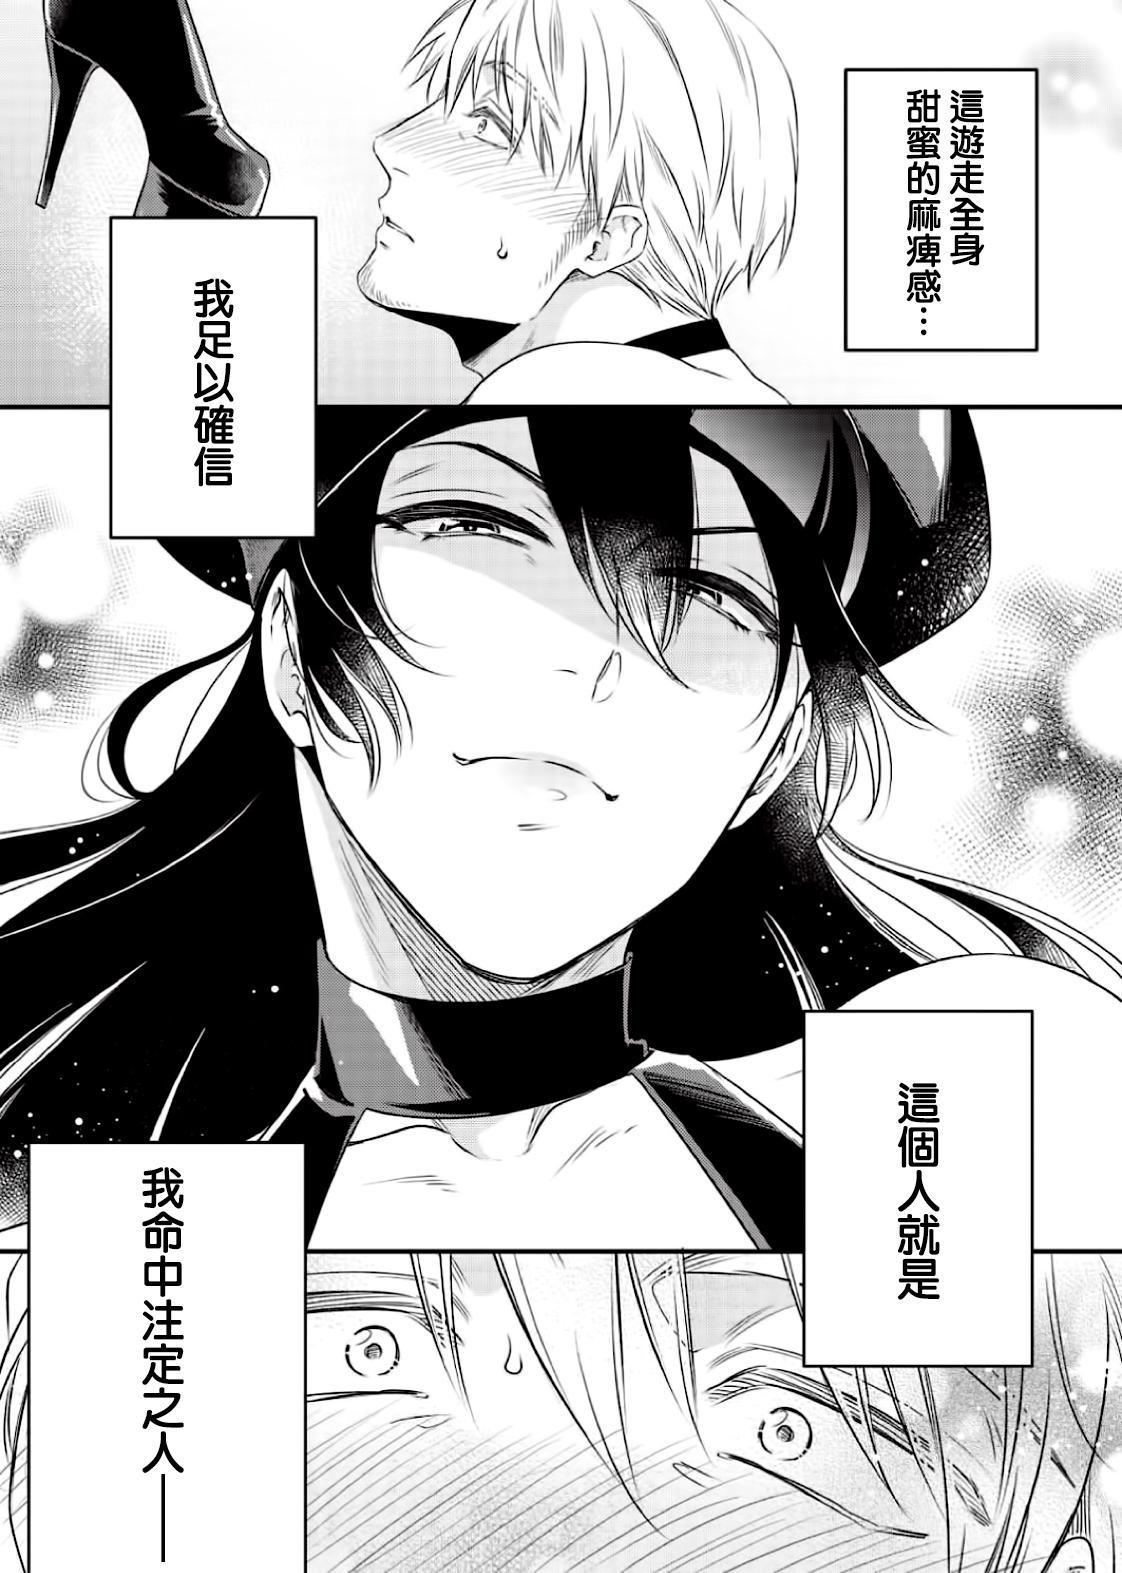 [Aion Kiu] Ijimete Kudasai Omega-sama ch.1-2 [Chinese] [沒有漢化] [Digital] 3